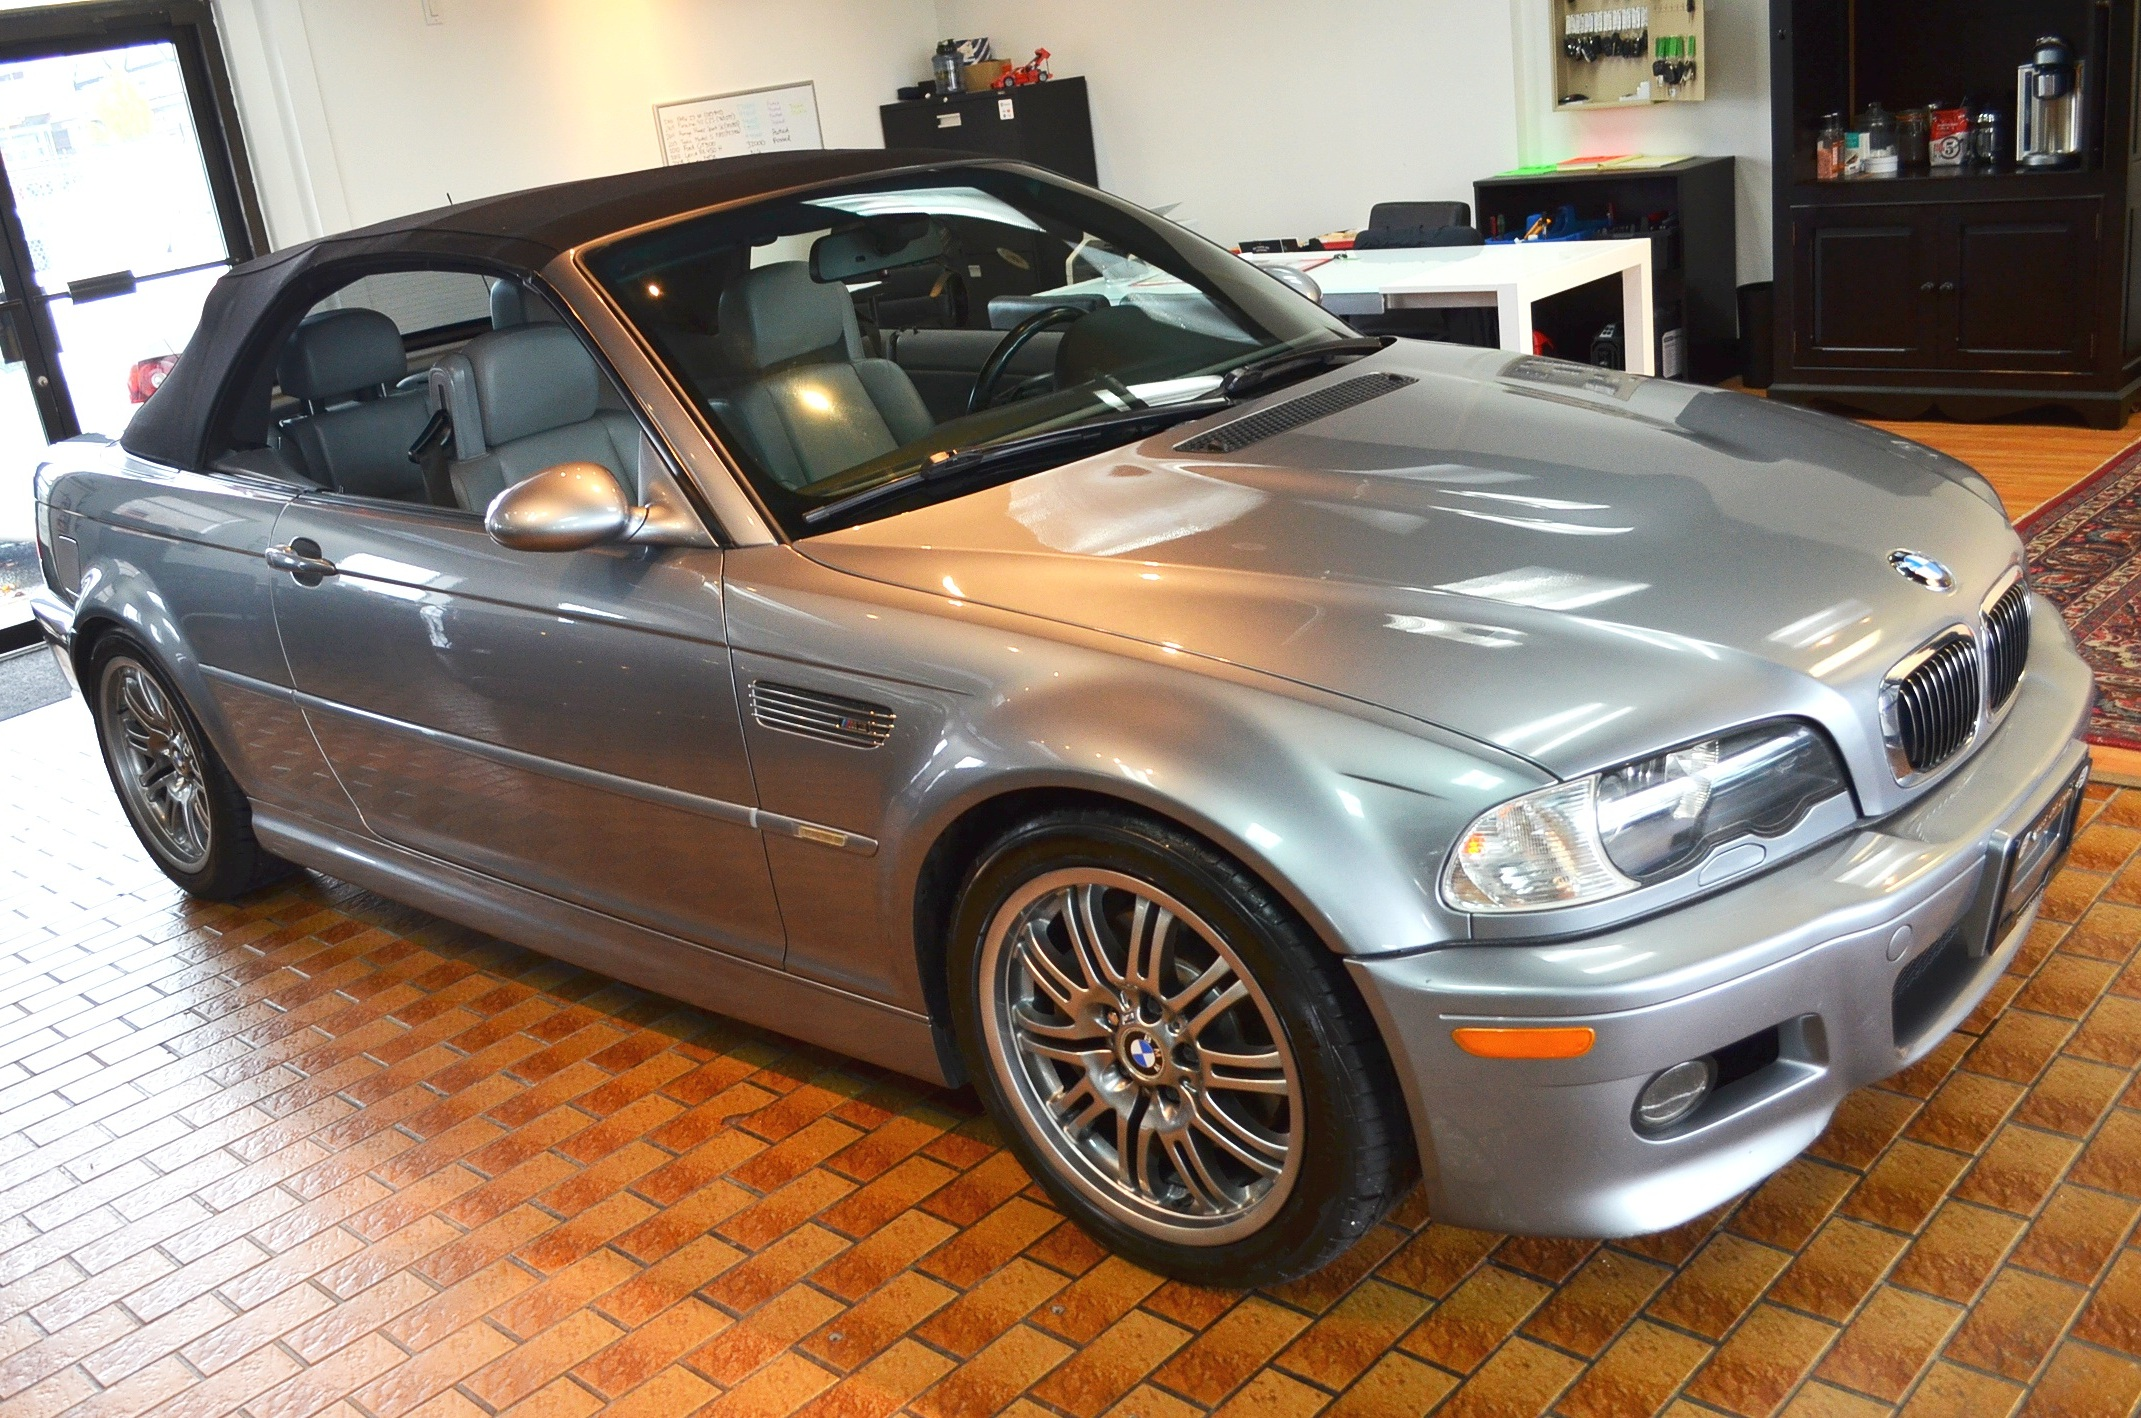 2005 BMW M3 CONVERTIBLE, SGM -